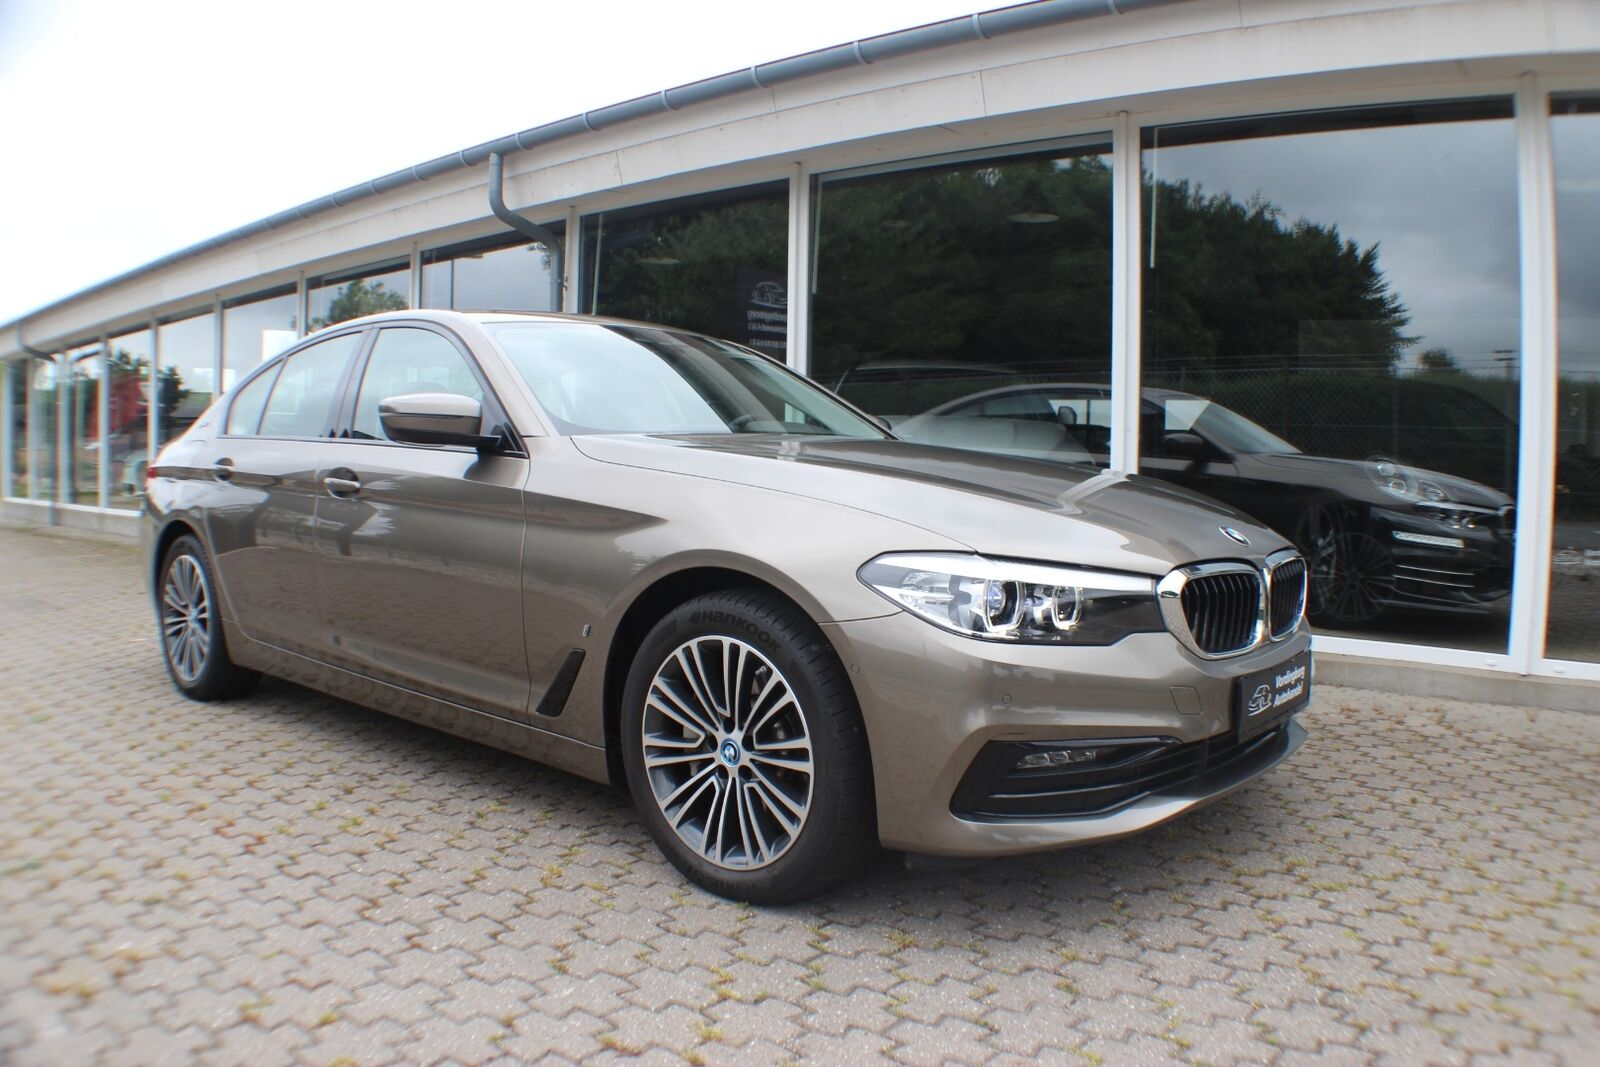 BMW 530e 2,0 iPerformance Sport Line aut. 4d - 419.900 kr.